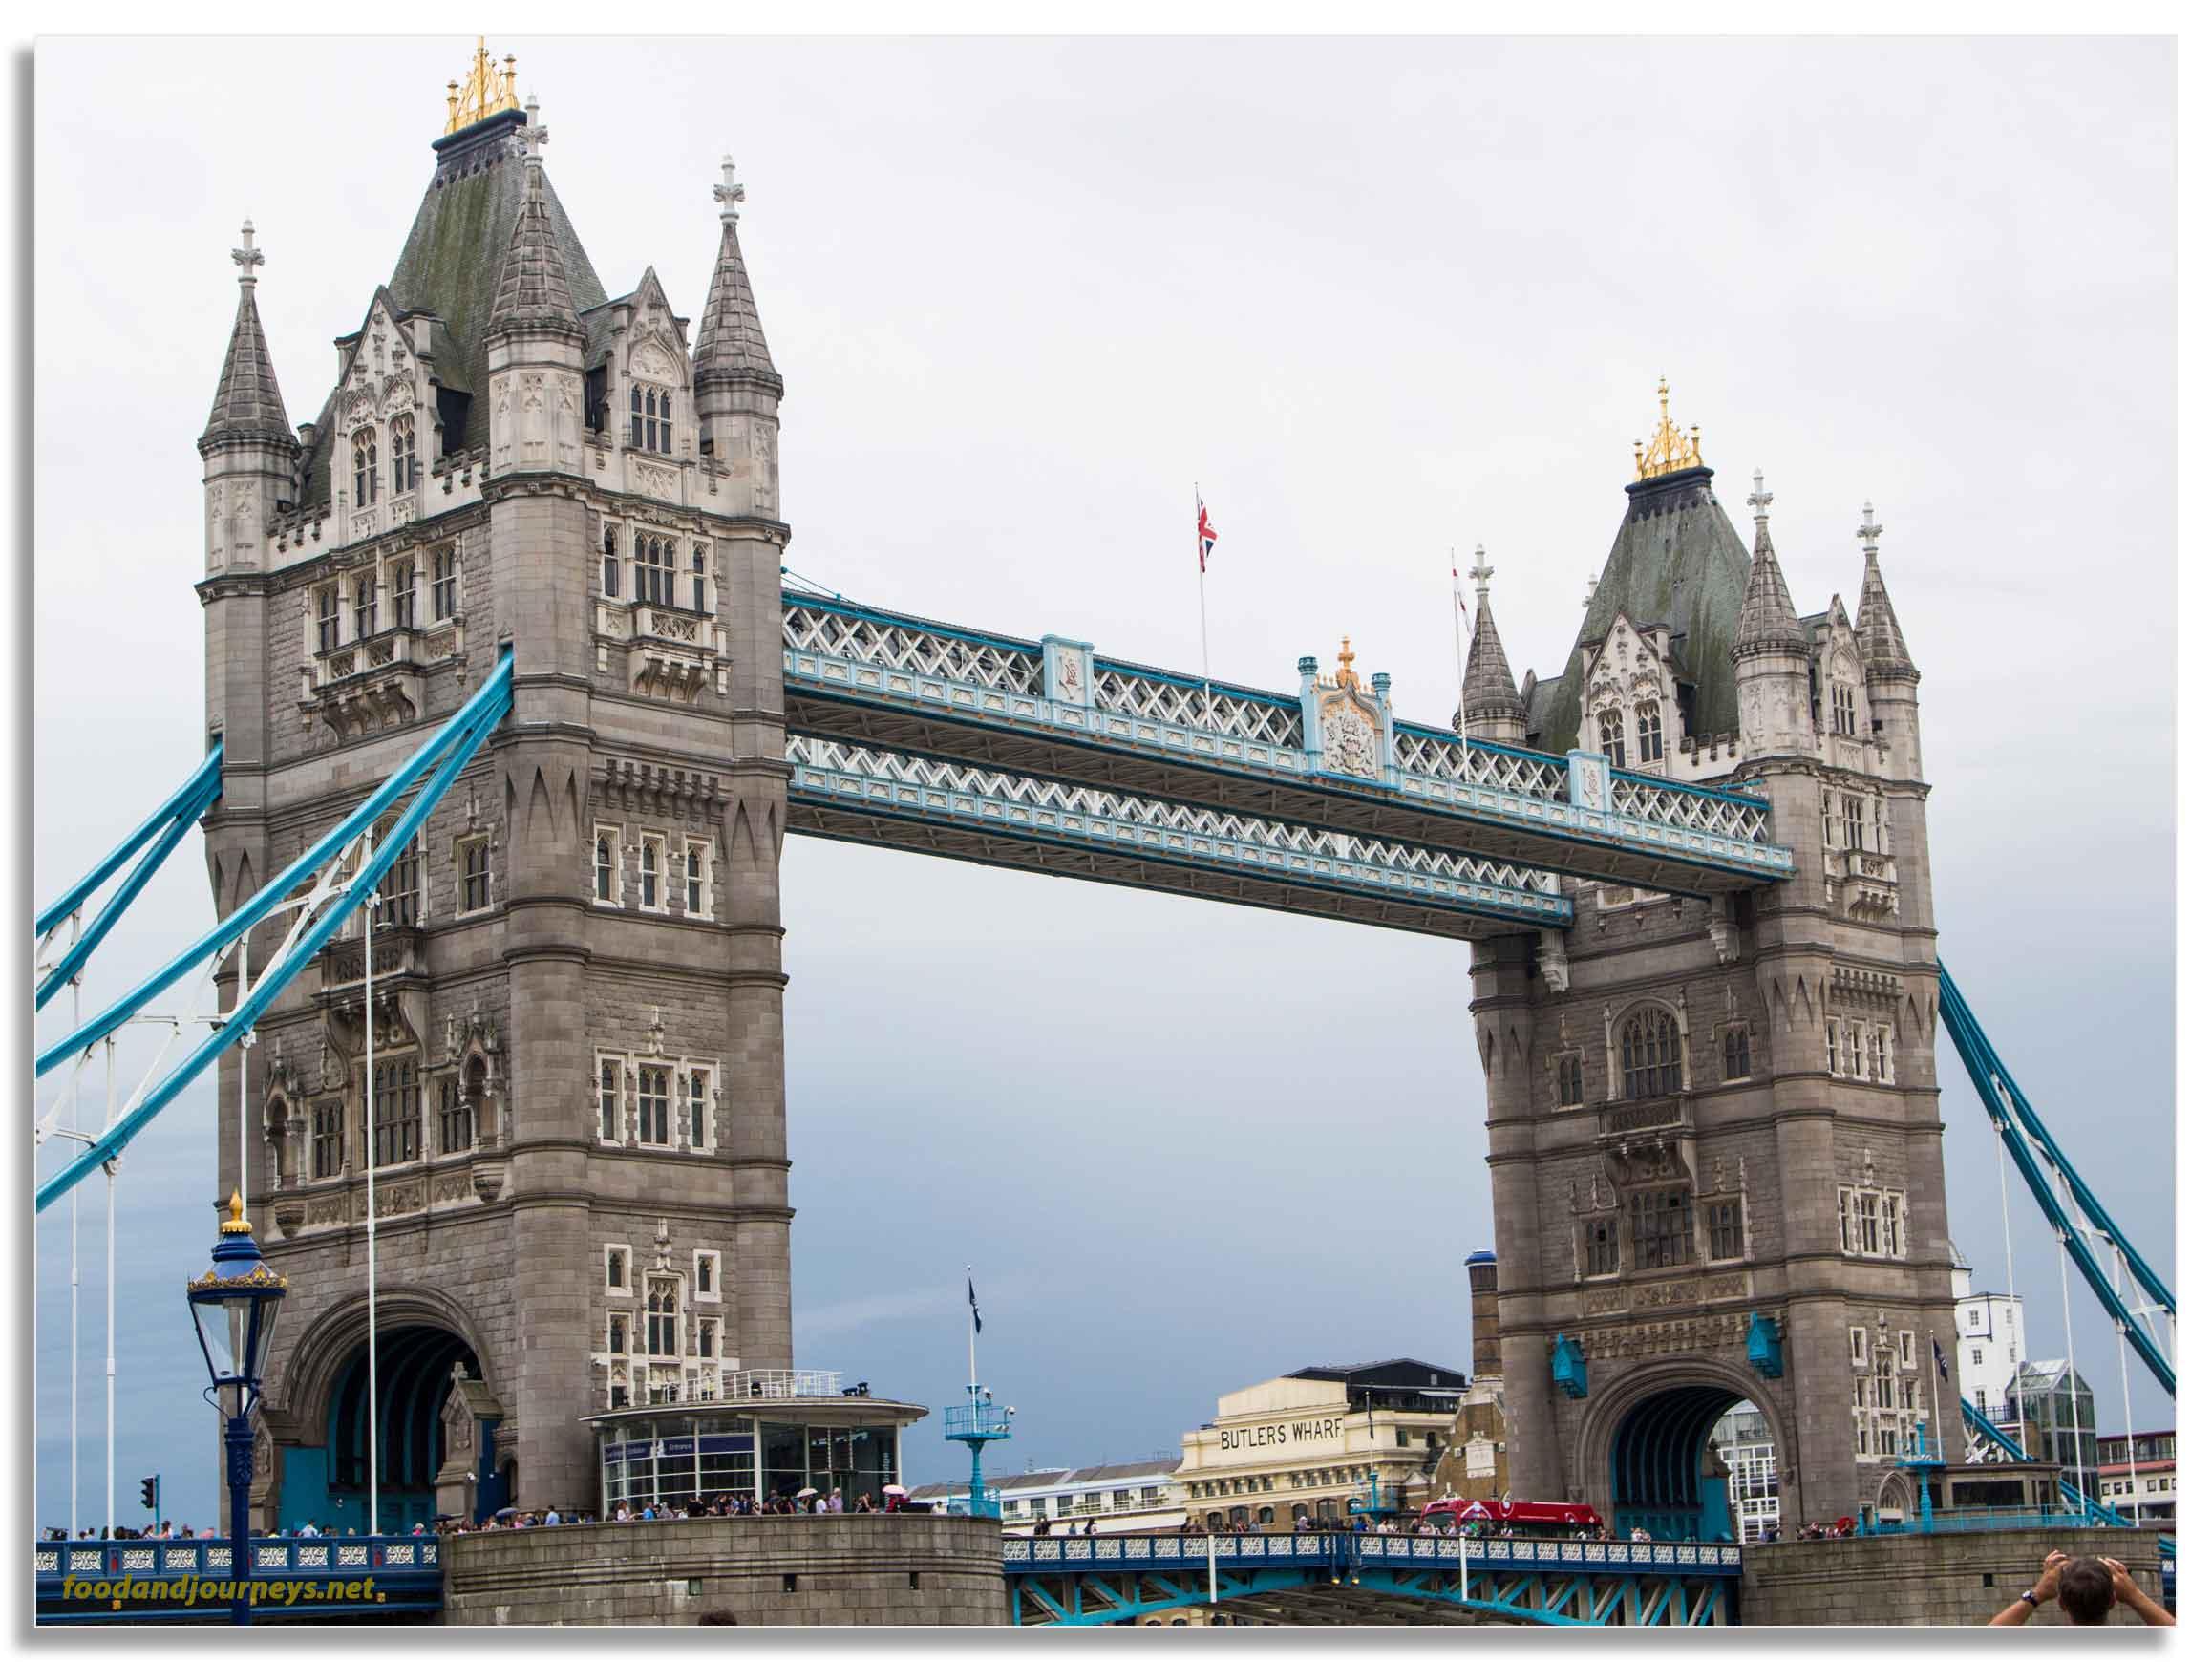 Tower Bridge London|foodandjourneys.net